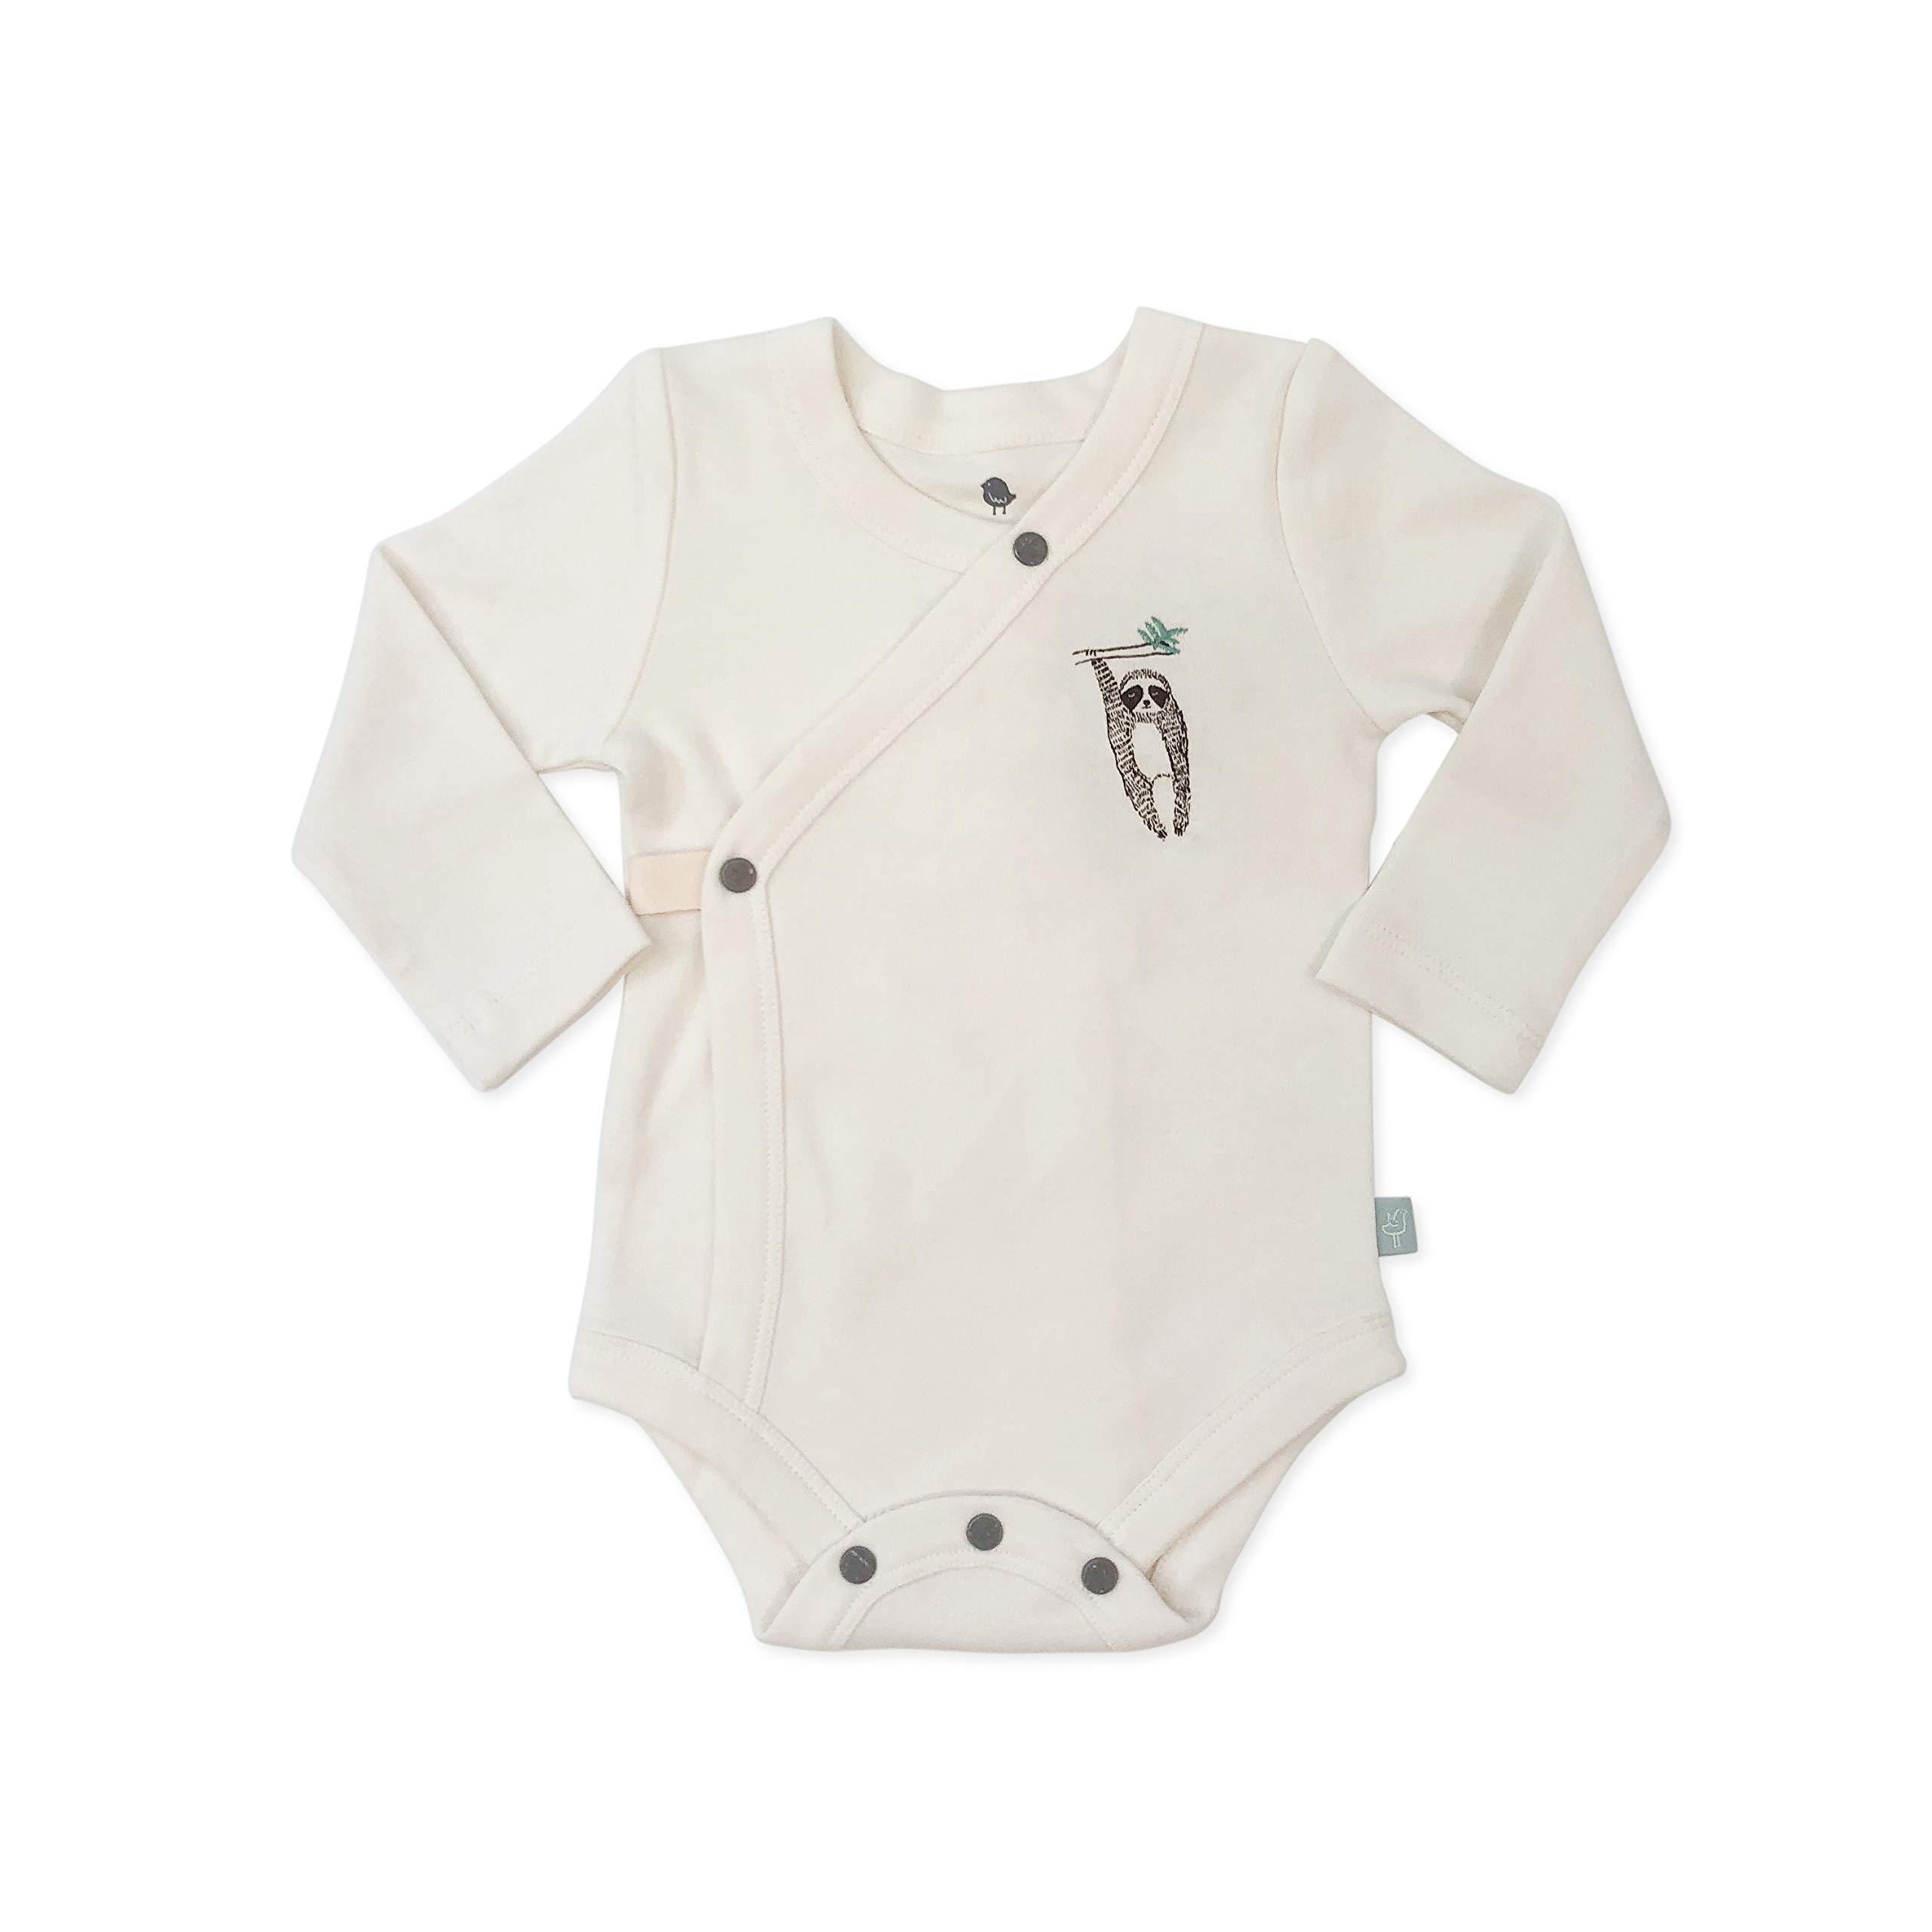 Finn + Emma Organic Cotton Long Sleeve Baby Bodysuit – Off White, 6-9 Months